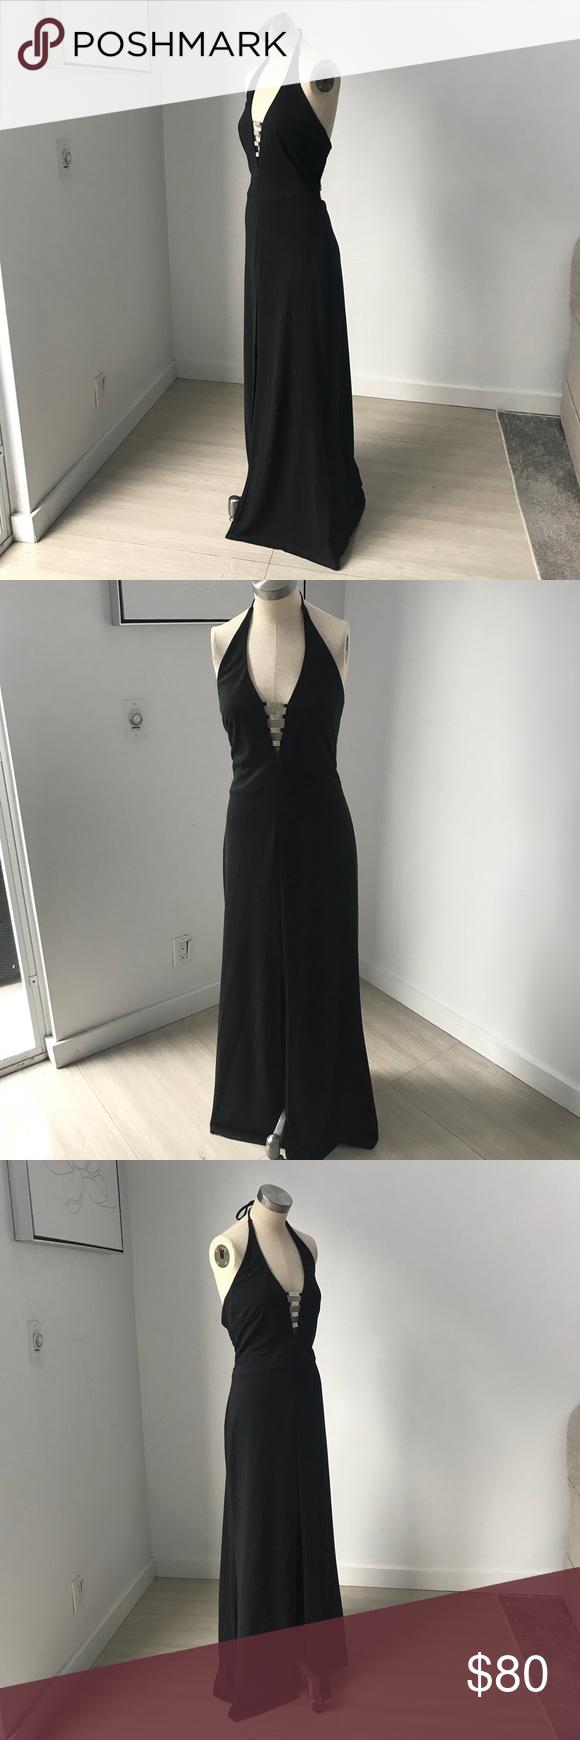 Morgan u co black backless formal prom dress in my posh